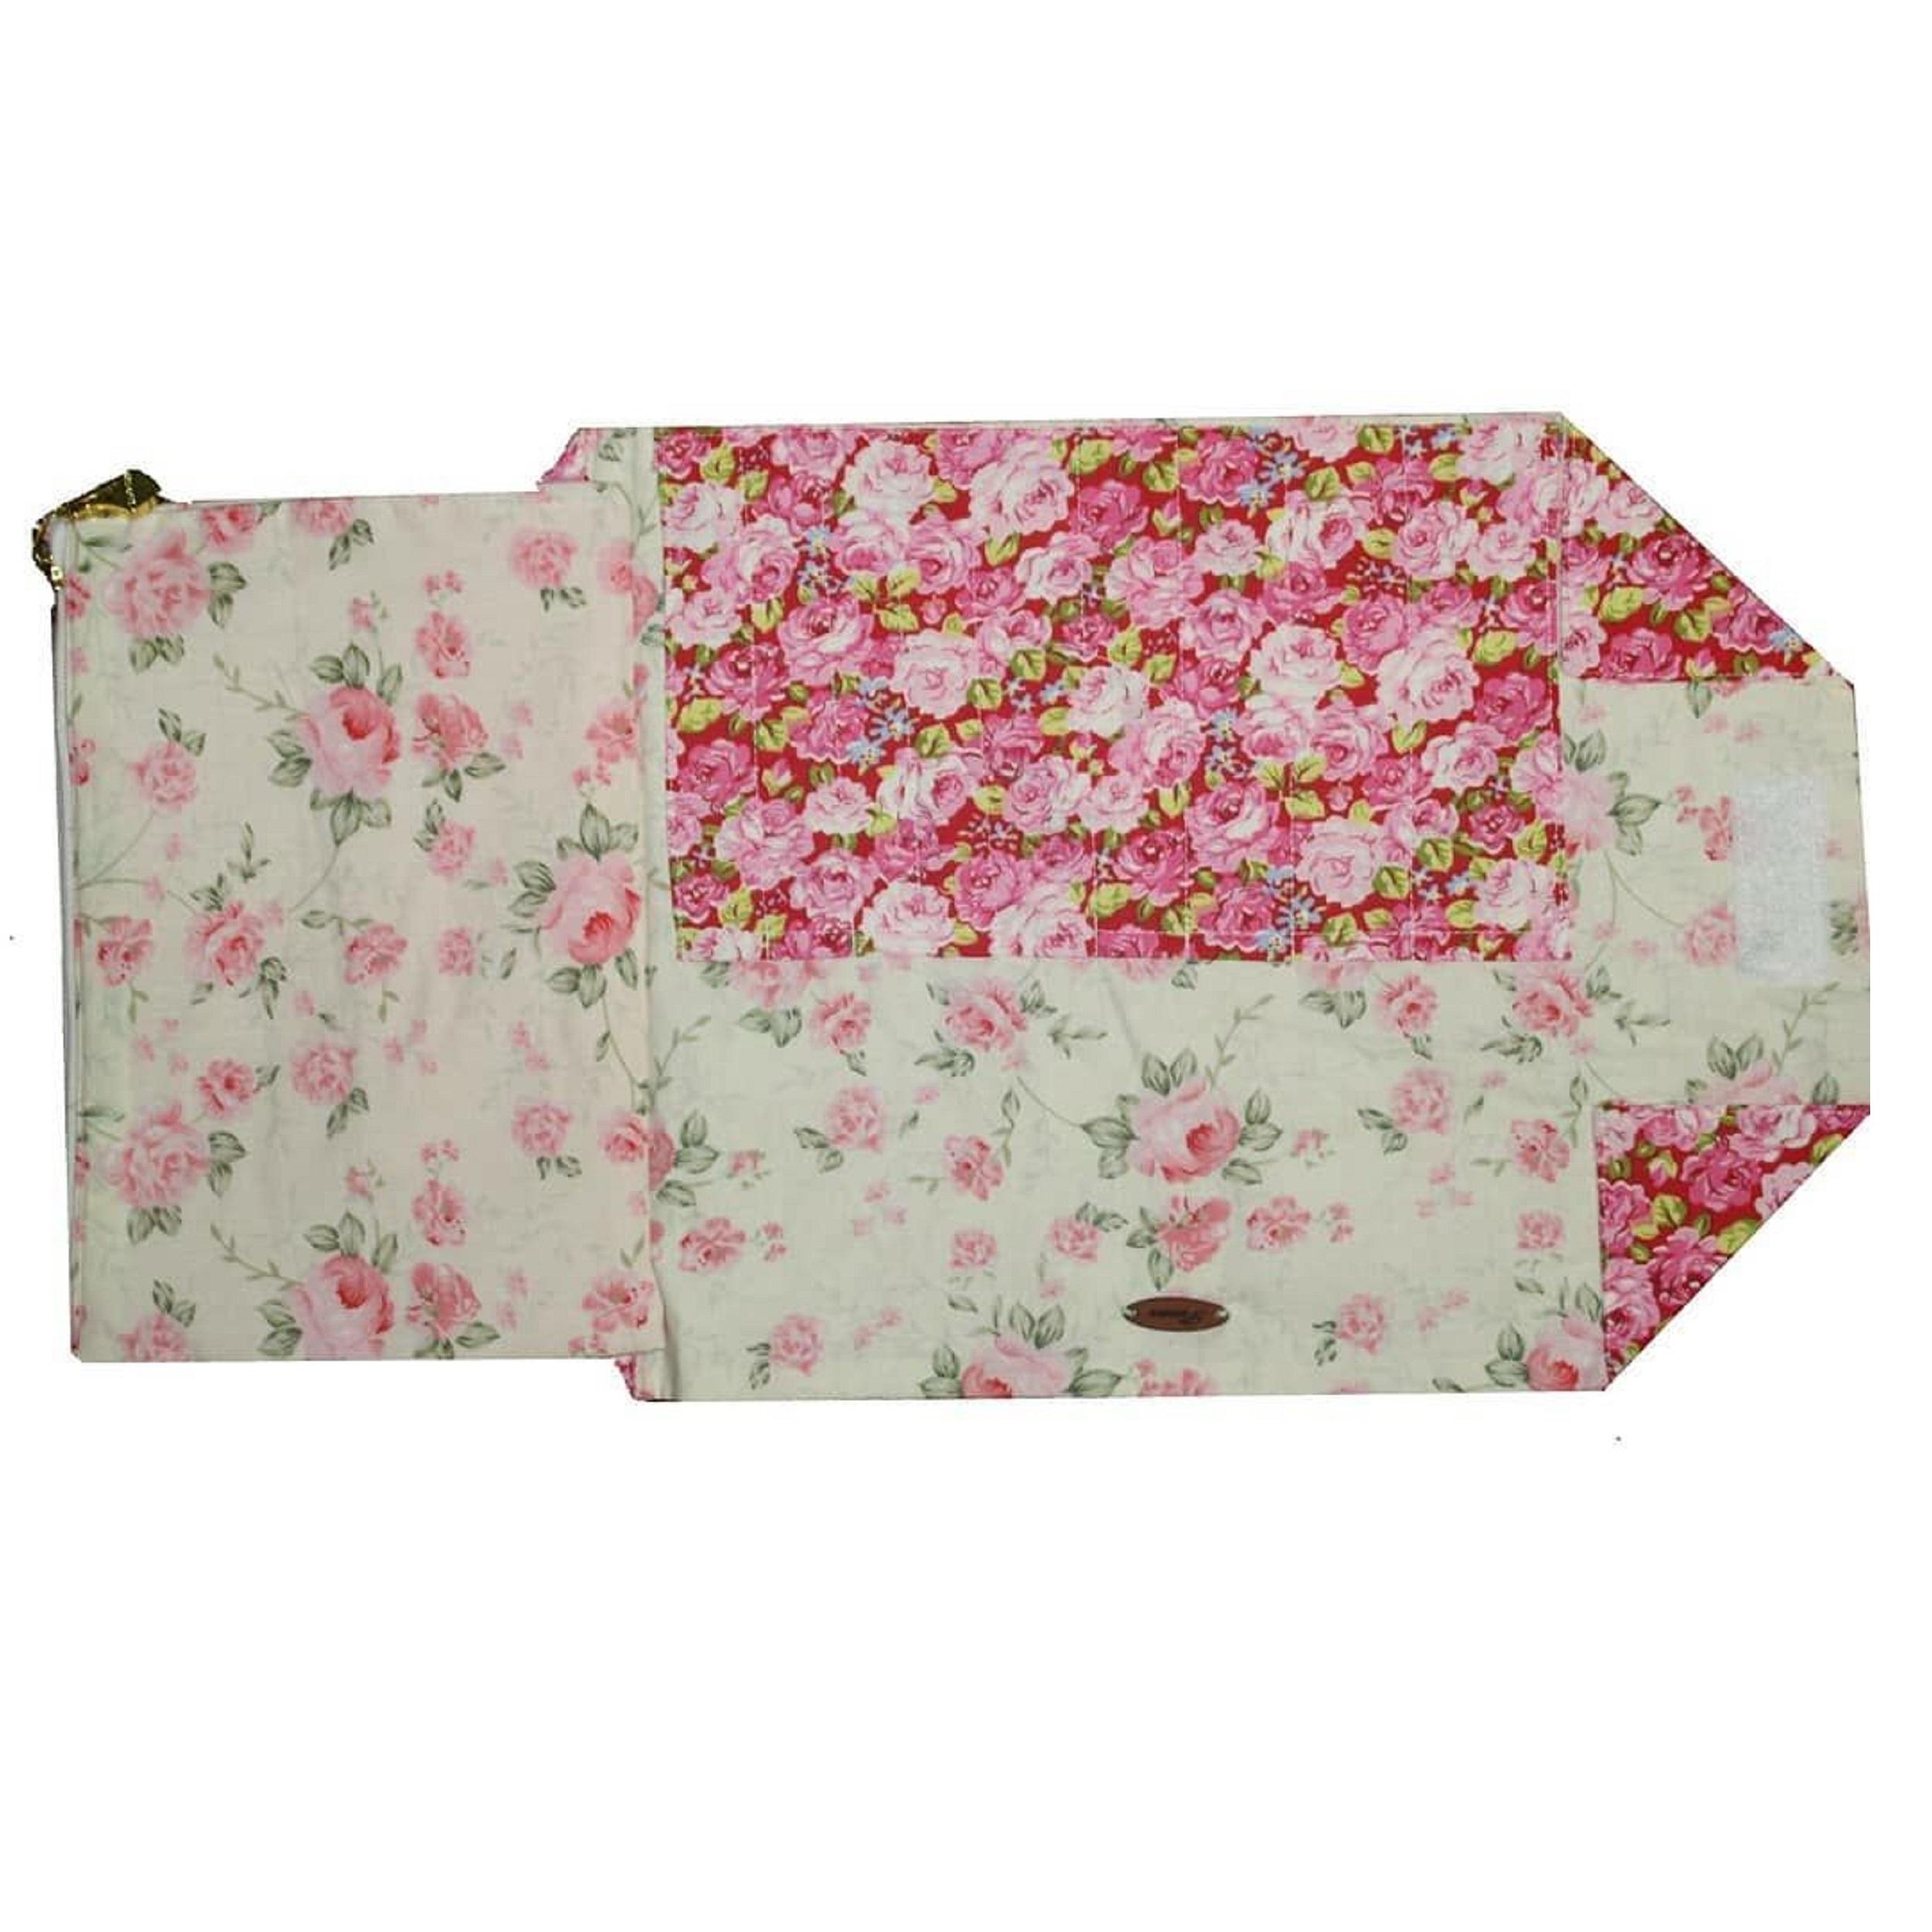 کیف لوازم آرایشی زنانه مدل 01